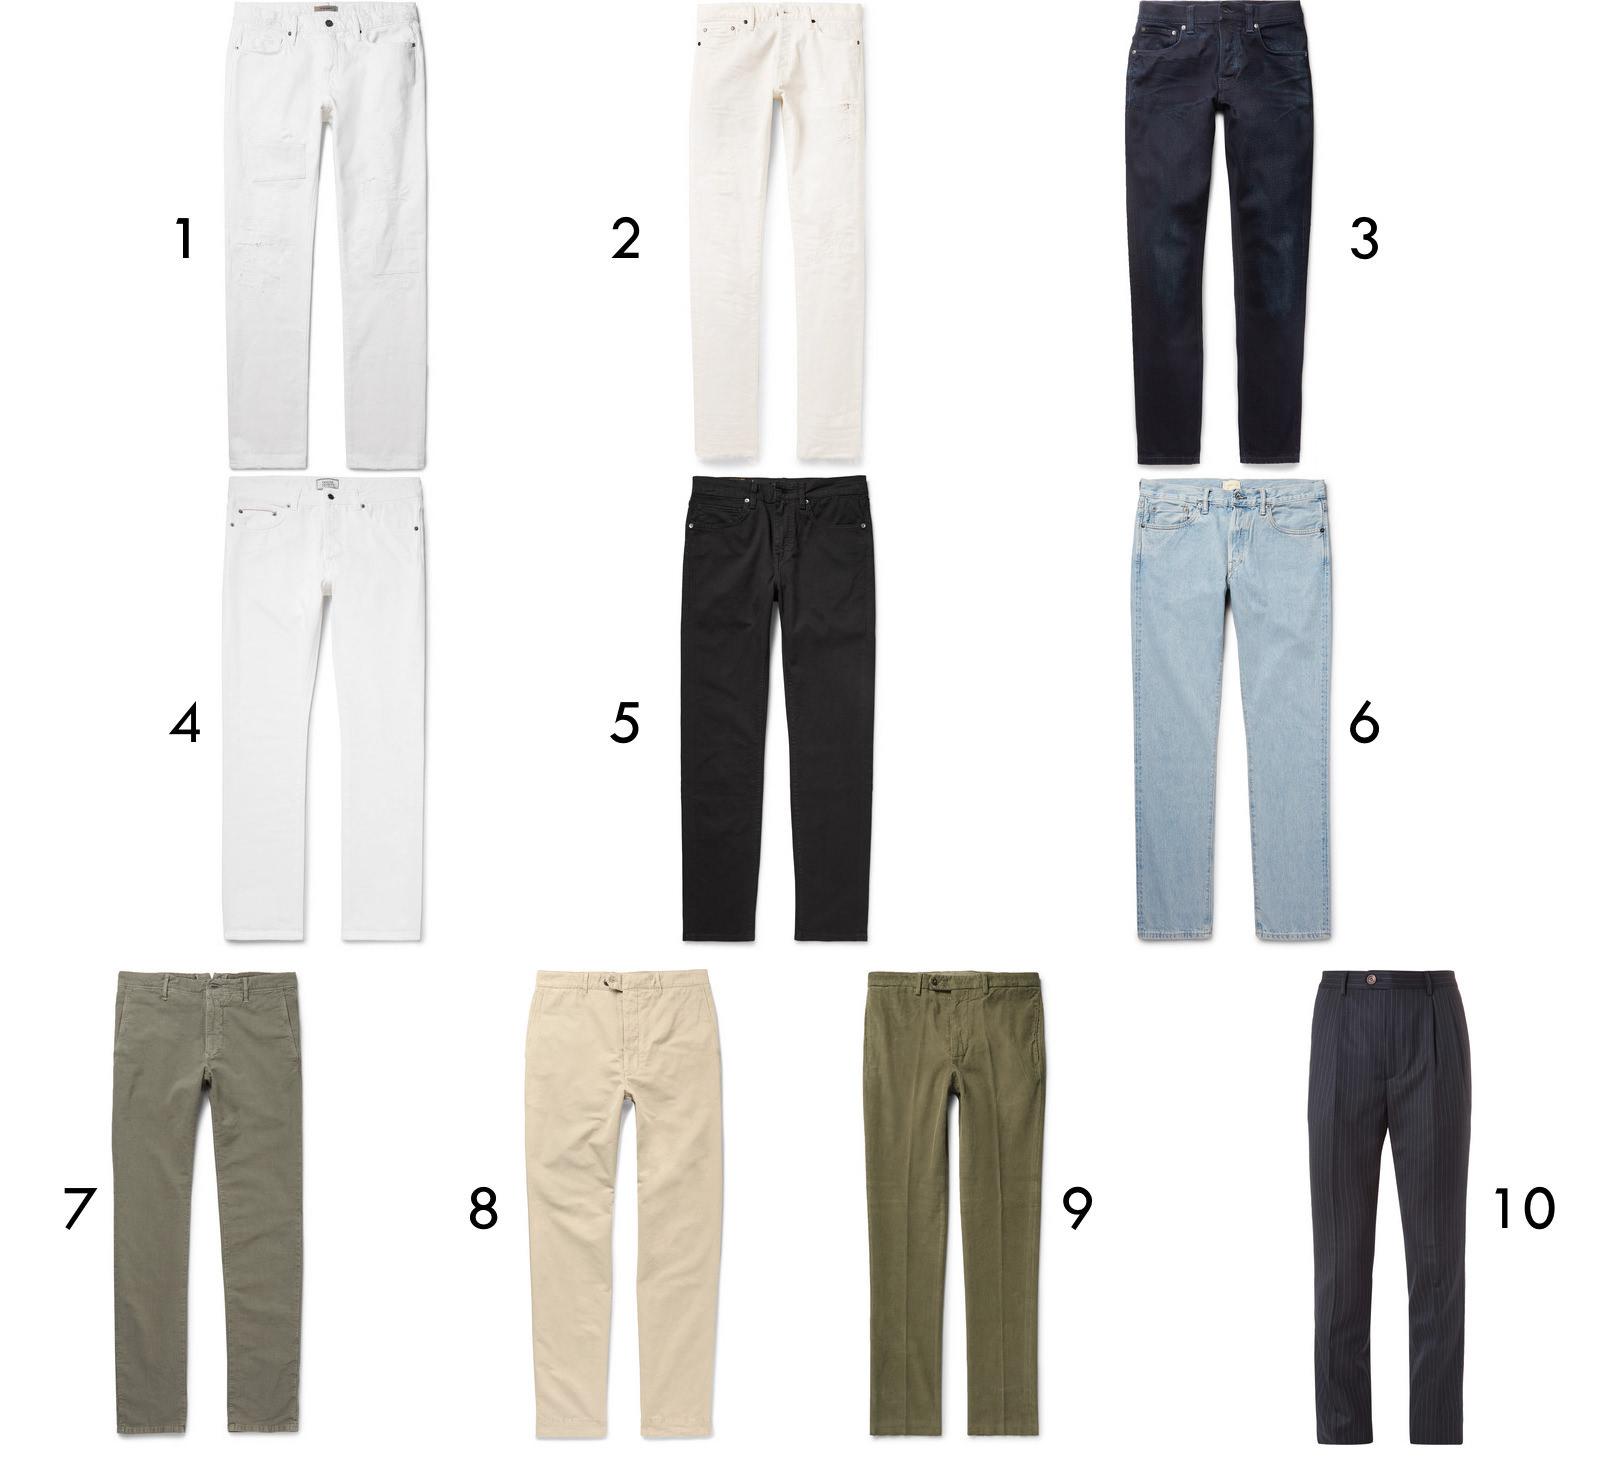 pantalons en soldes chez MrPorter